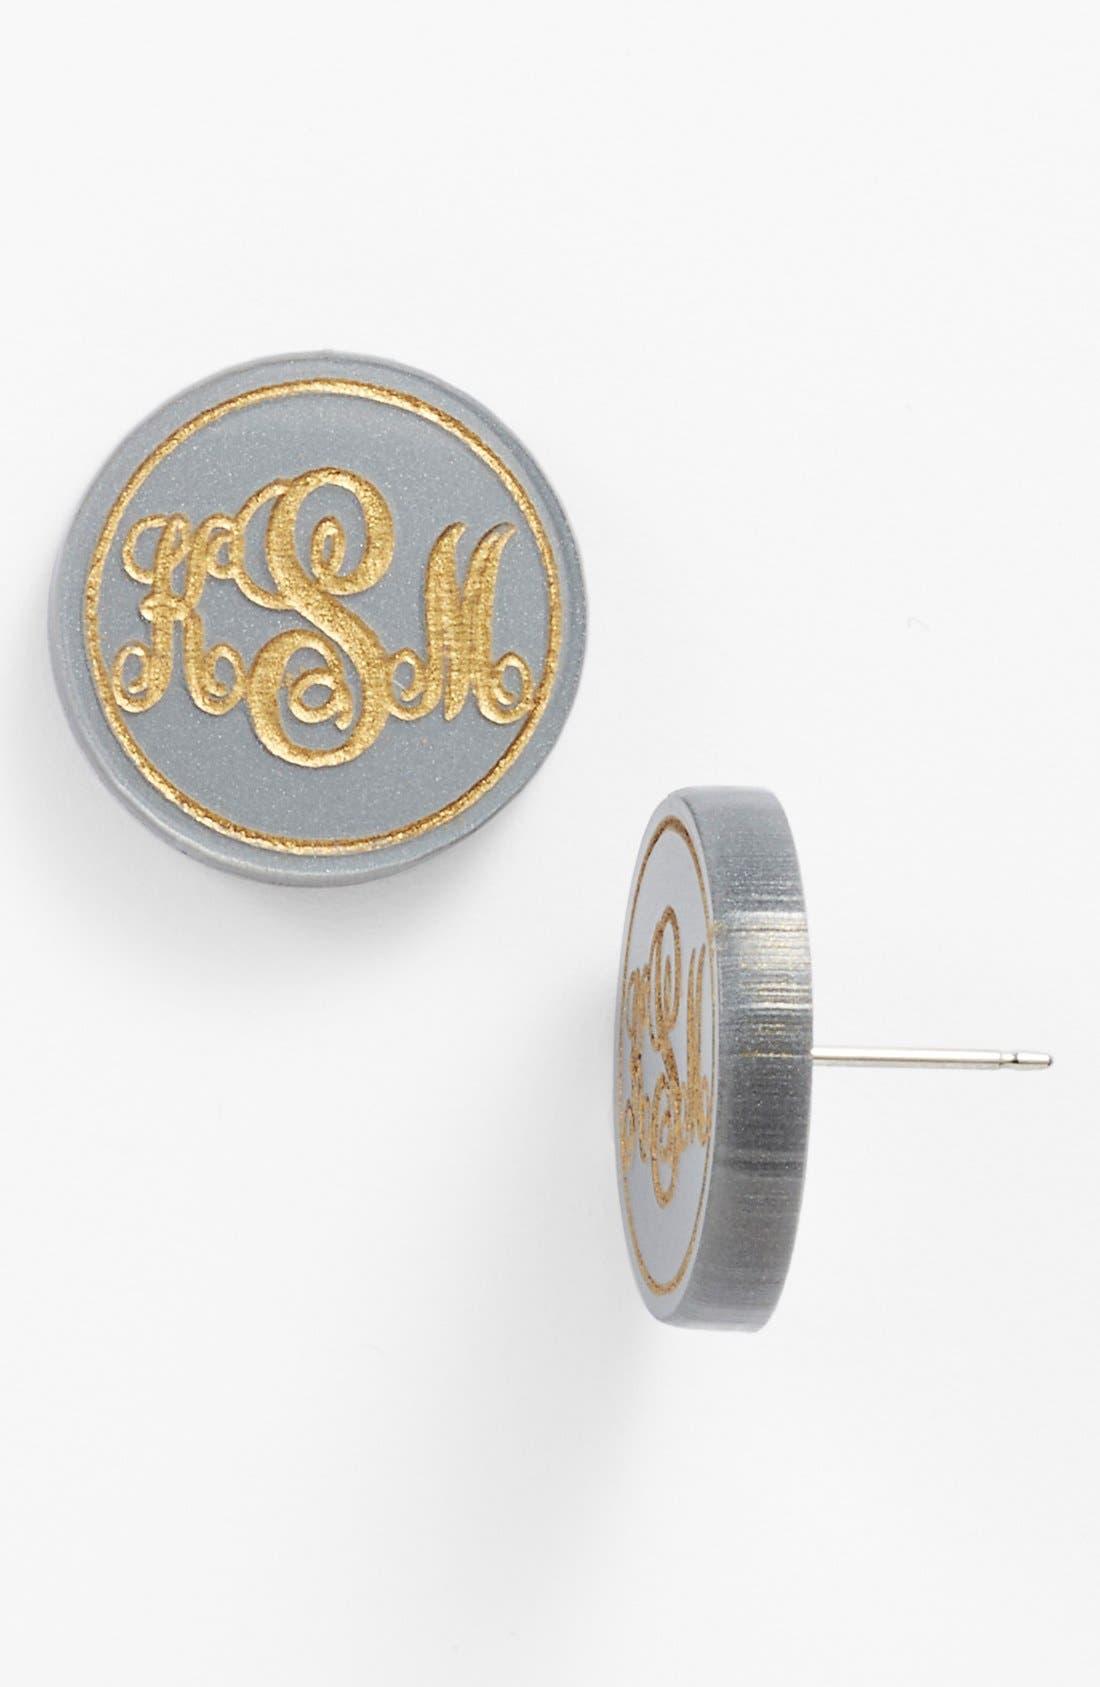 'Chelsea' Medium Personalized Monogram Stud Earrings,                             Main thumbnail 1, color,                             Gunmetal/ Gold